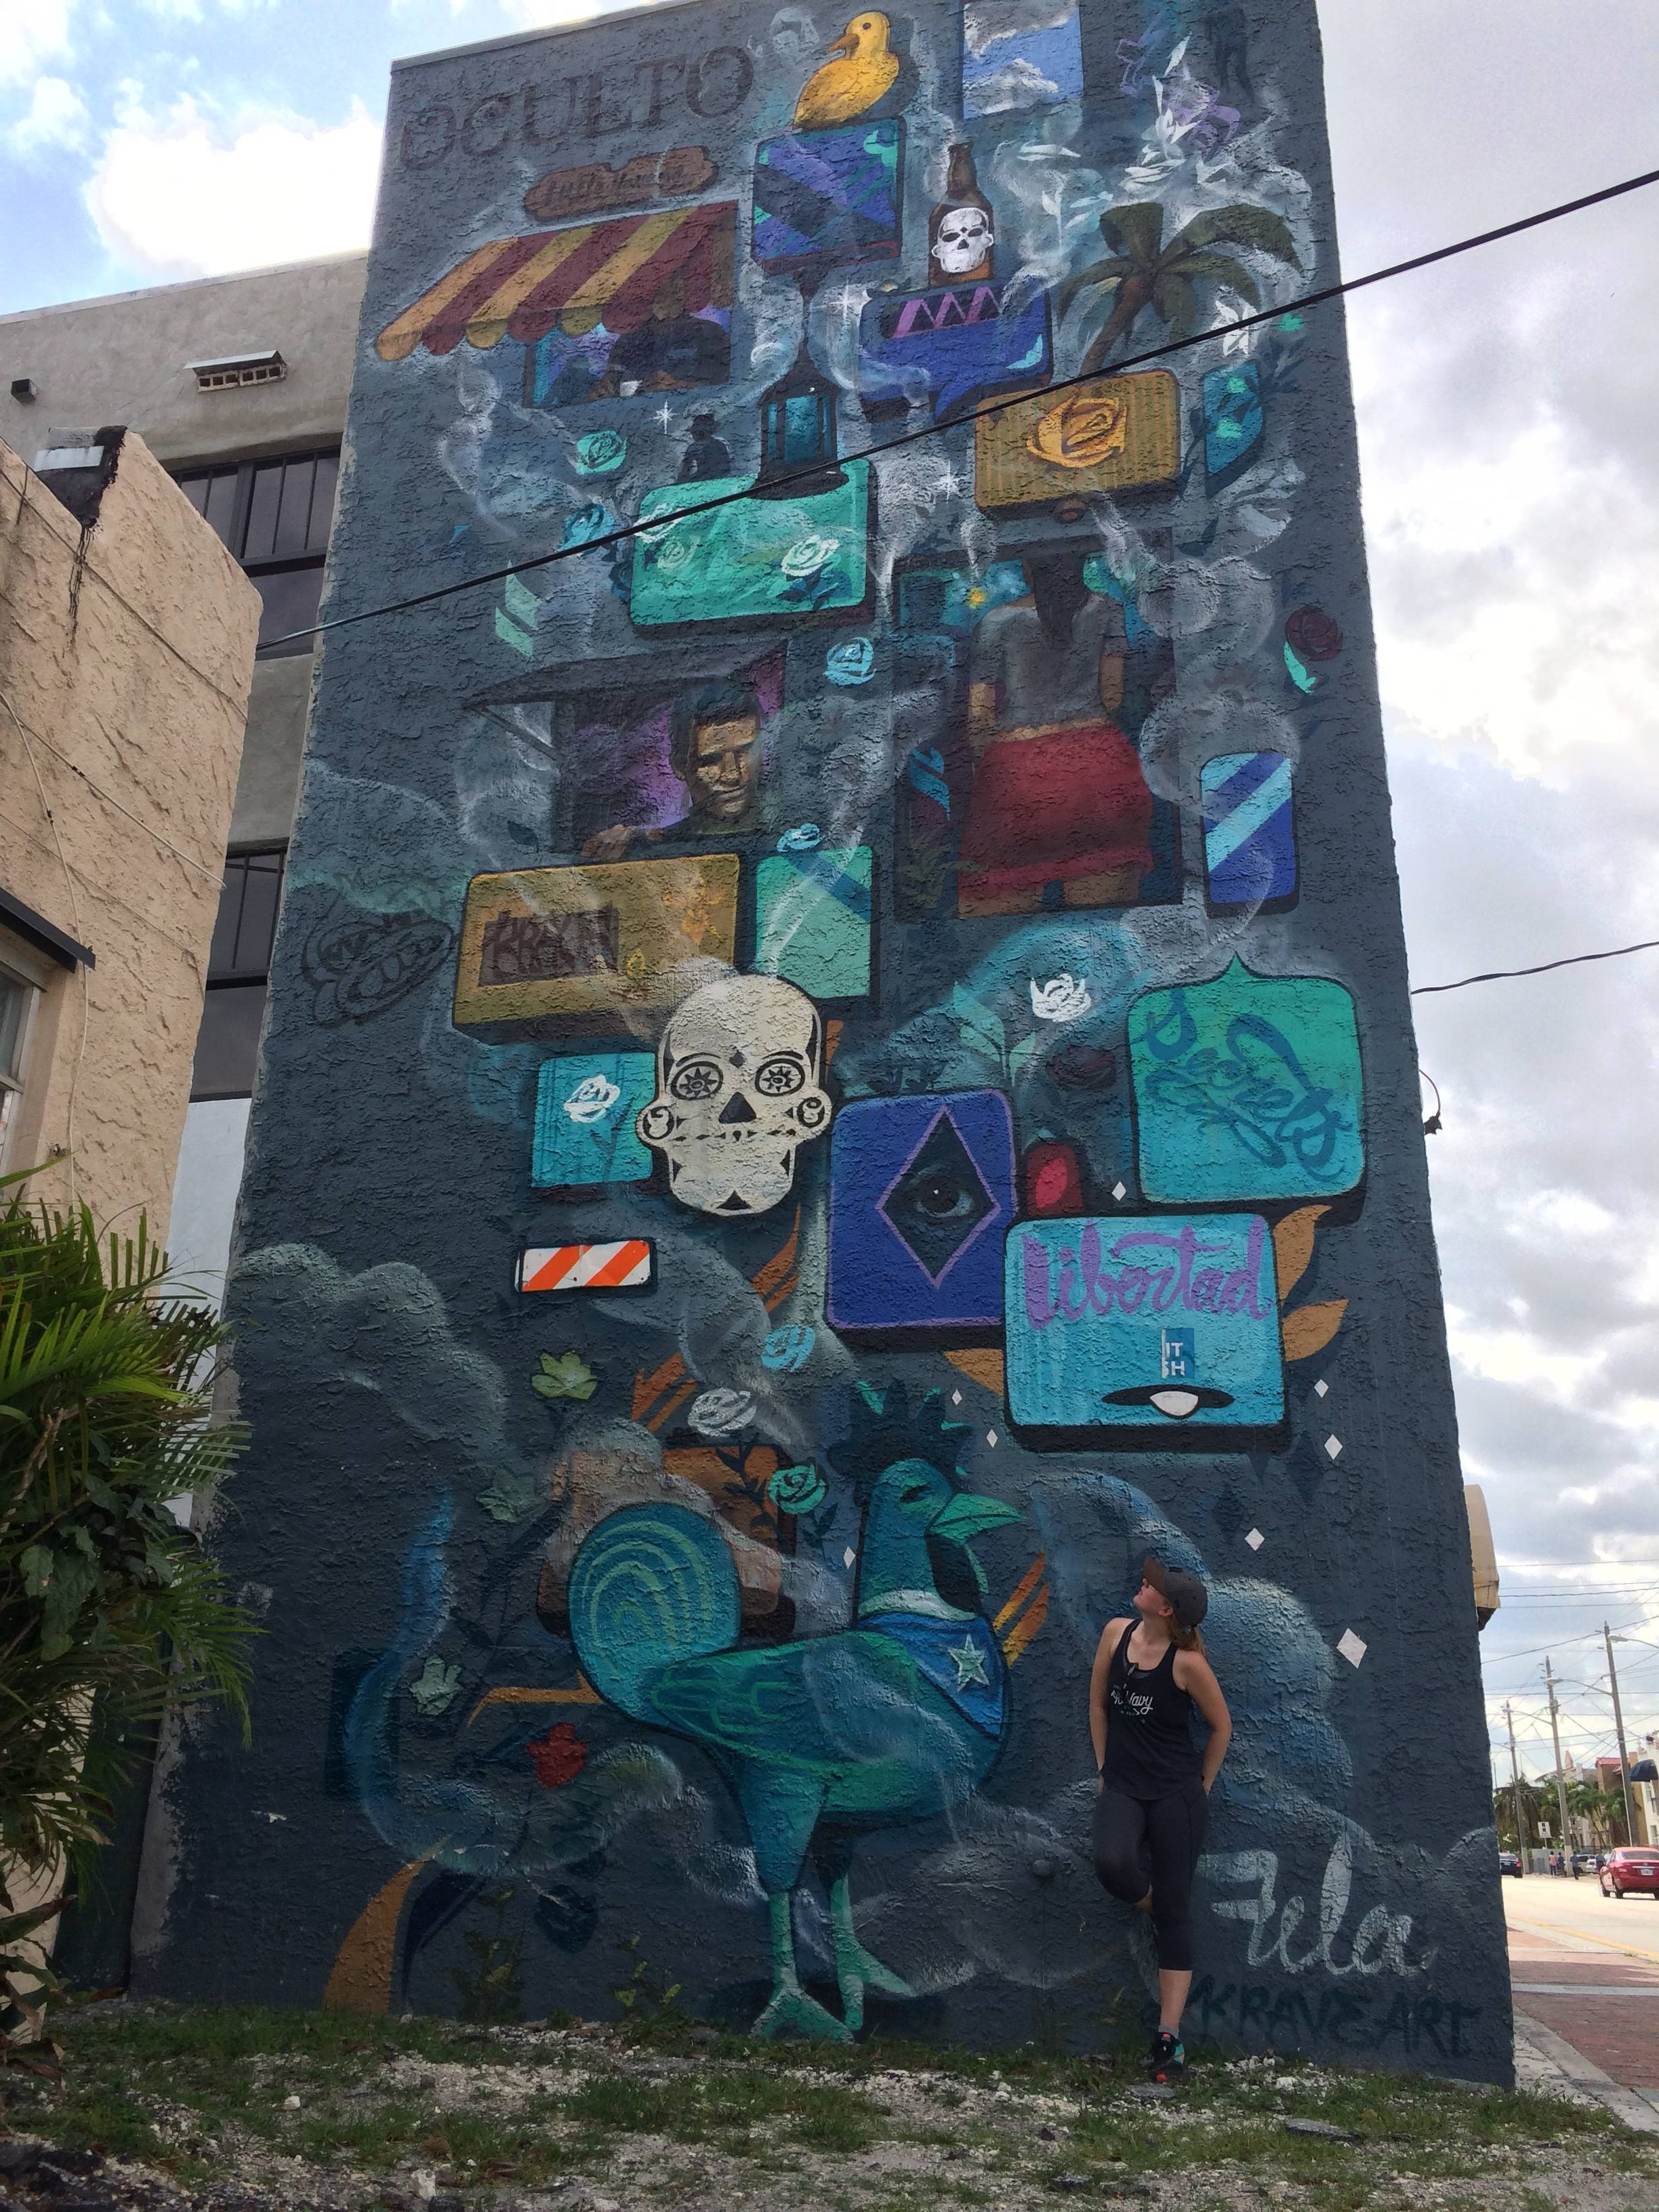 Photo 3: Miami entre copines